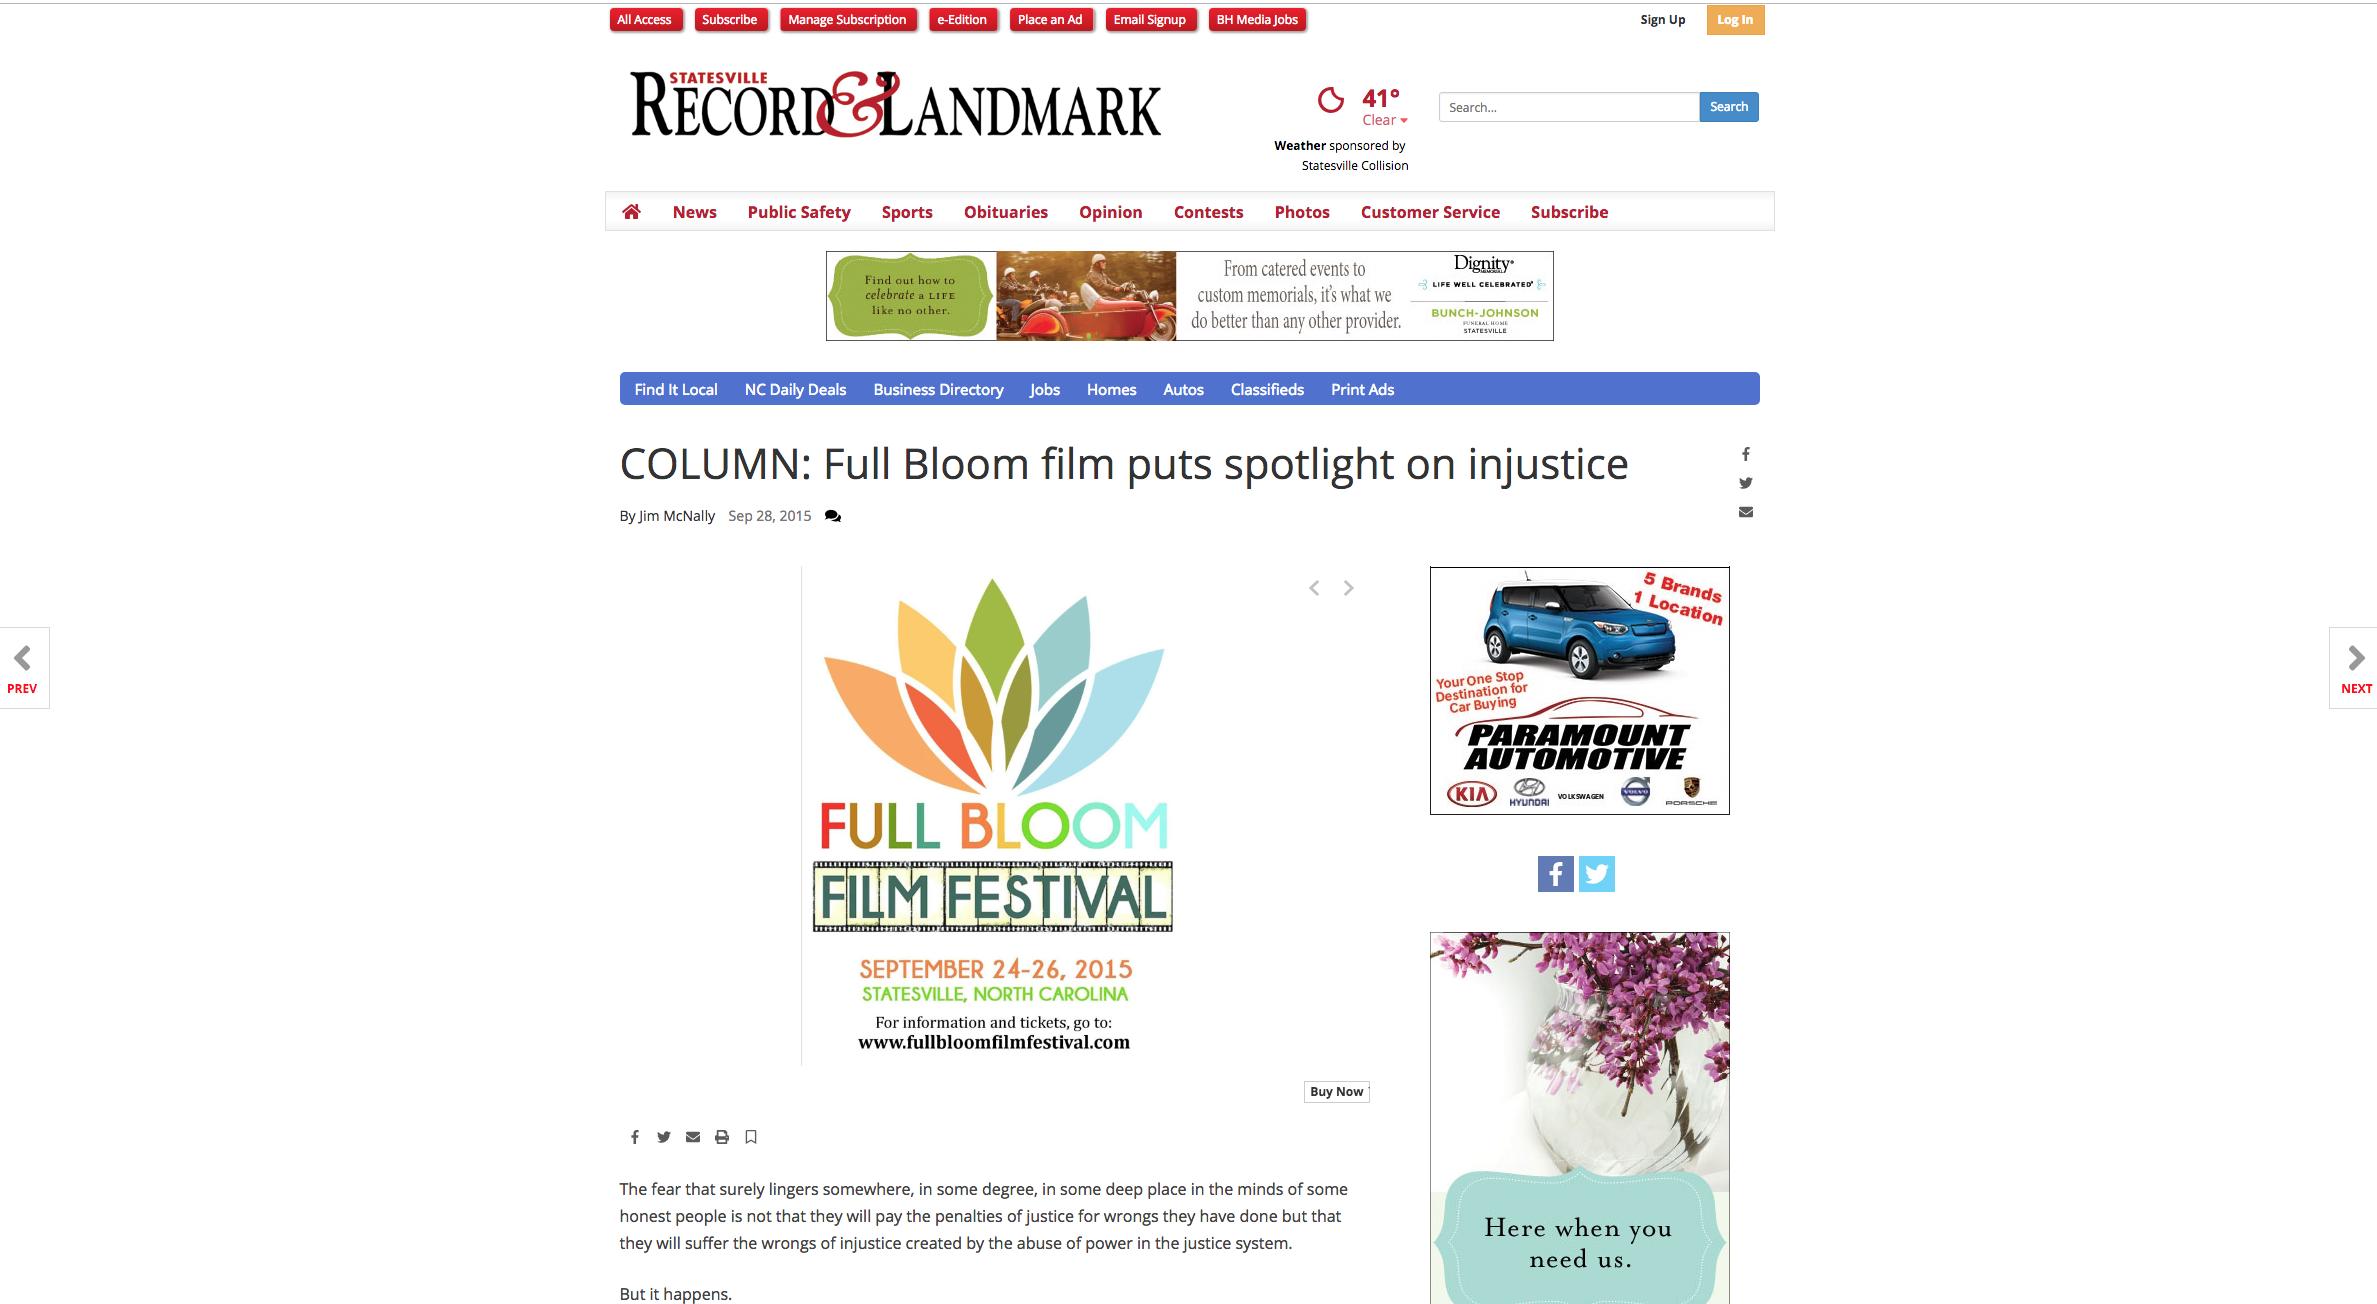 STATESVILLE RECORD & LANDMARK - Full Bloom film puts spotlight on injustice. SEPTEMBER 29TH, 2015